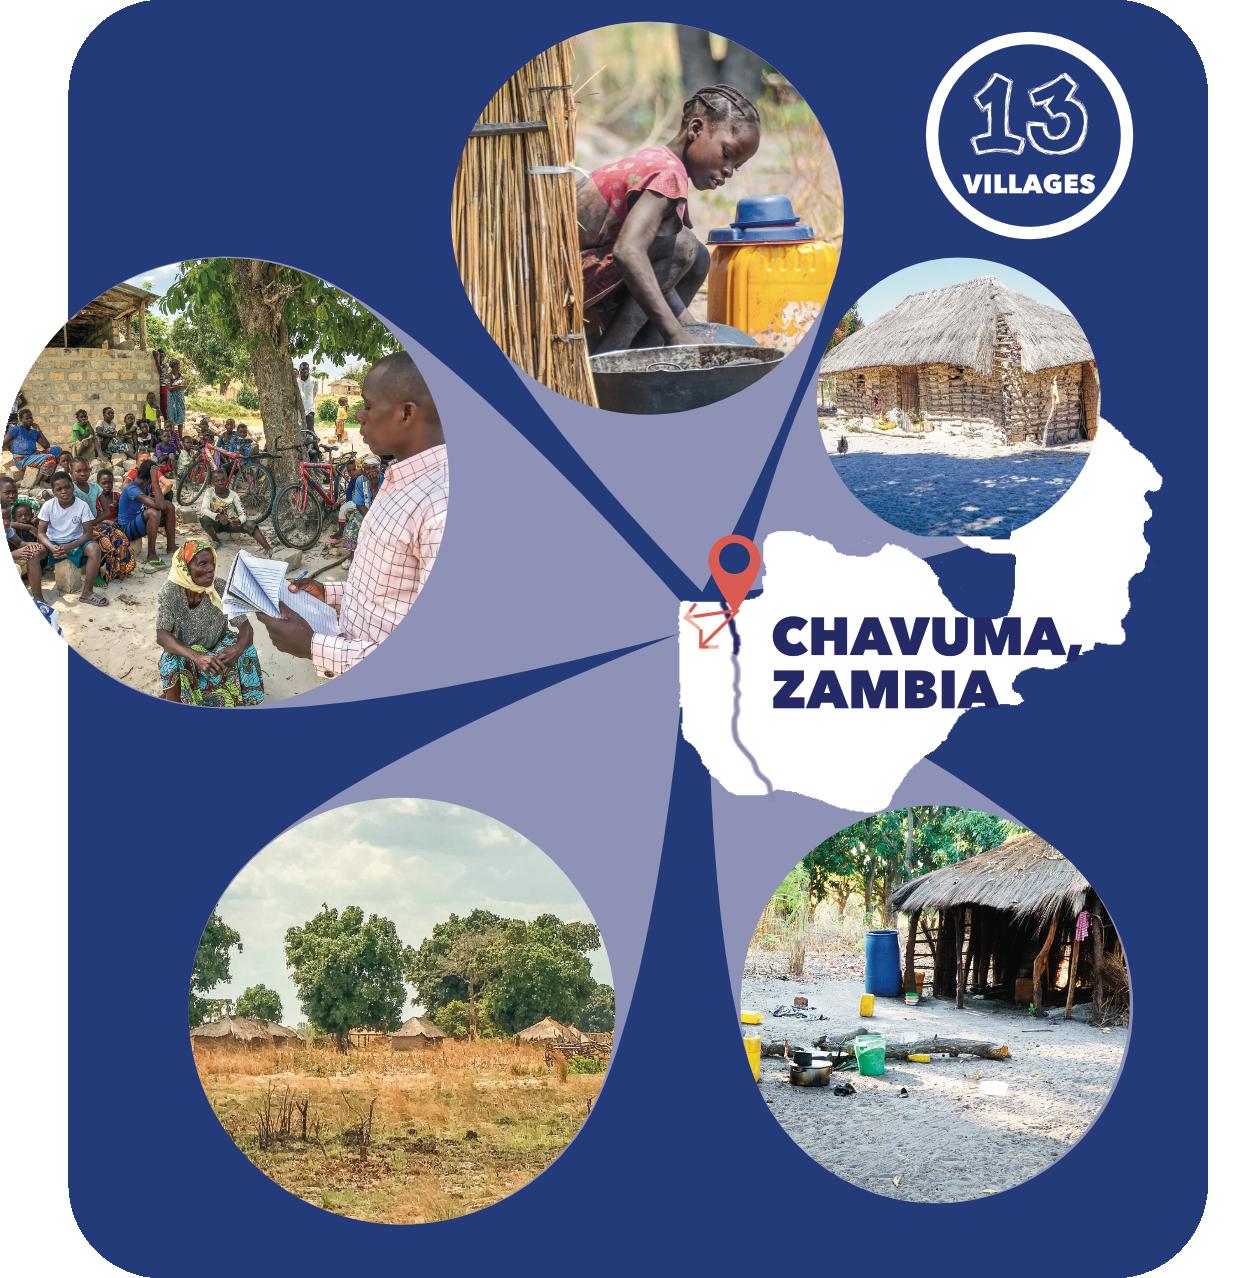 Chavuma, Zambia, Leach